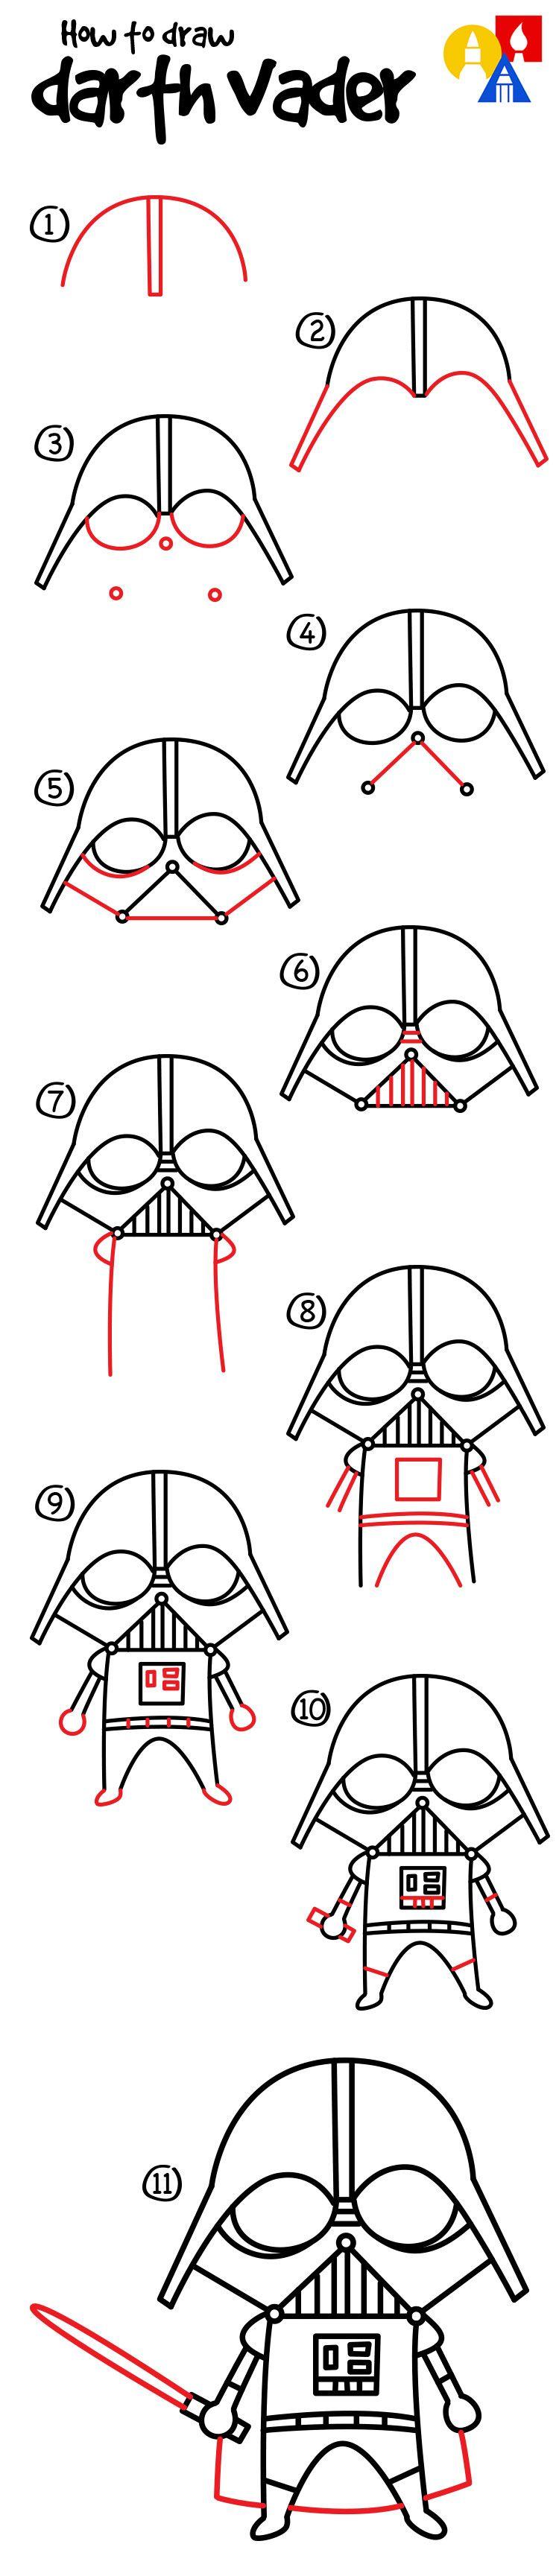 How To Draw A Cartoon Darth Vader.